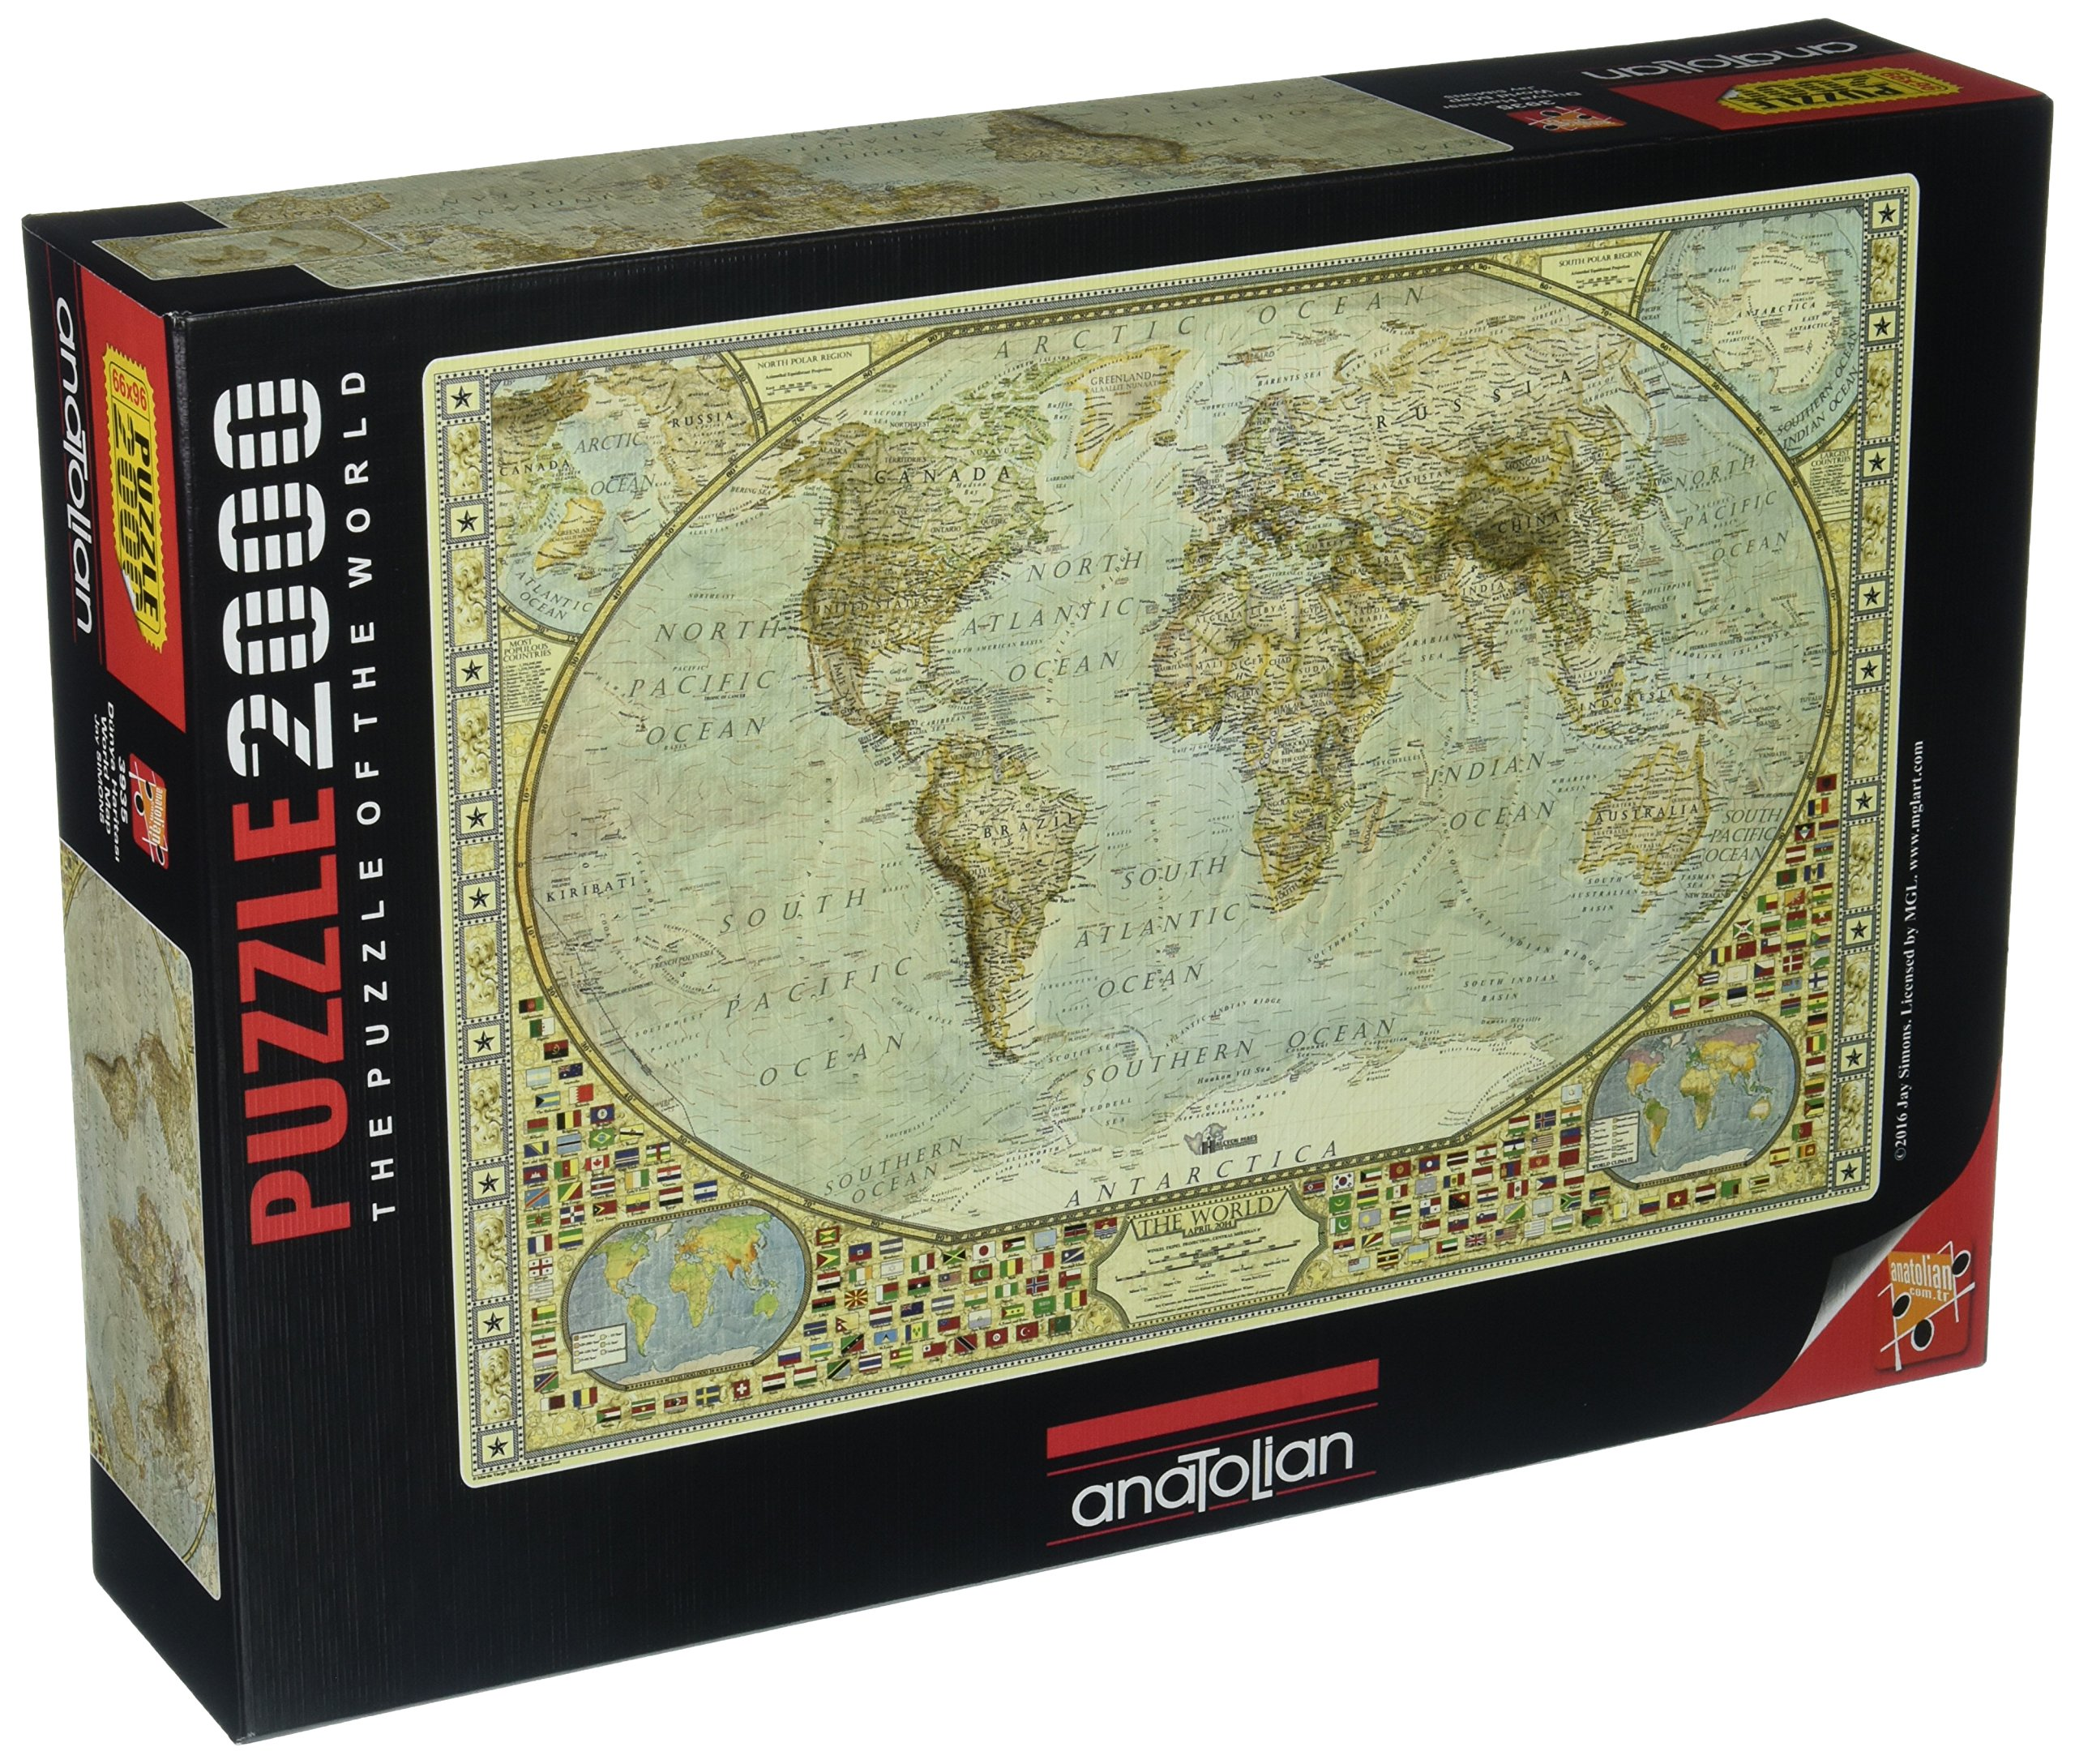 Anatolian world map jigsaw puzzle 2000 piece premium quality free anatolian world map jigsaw puzzle 2000 piece premium quality free shipping new gumiabroncs Image collections